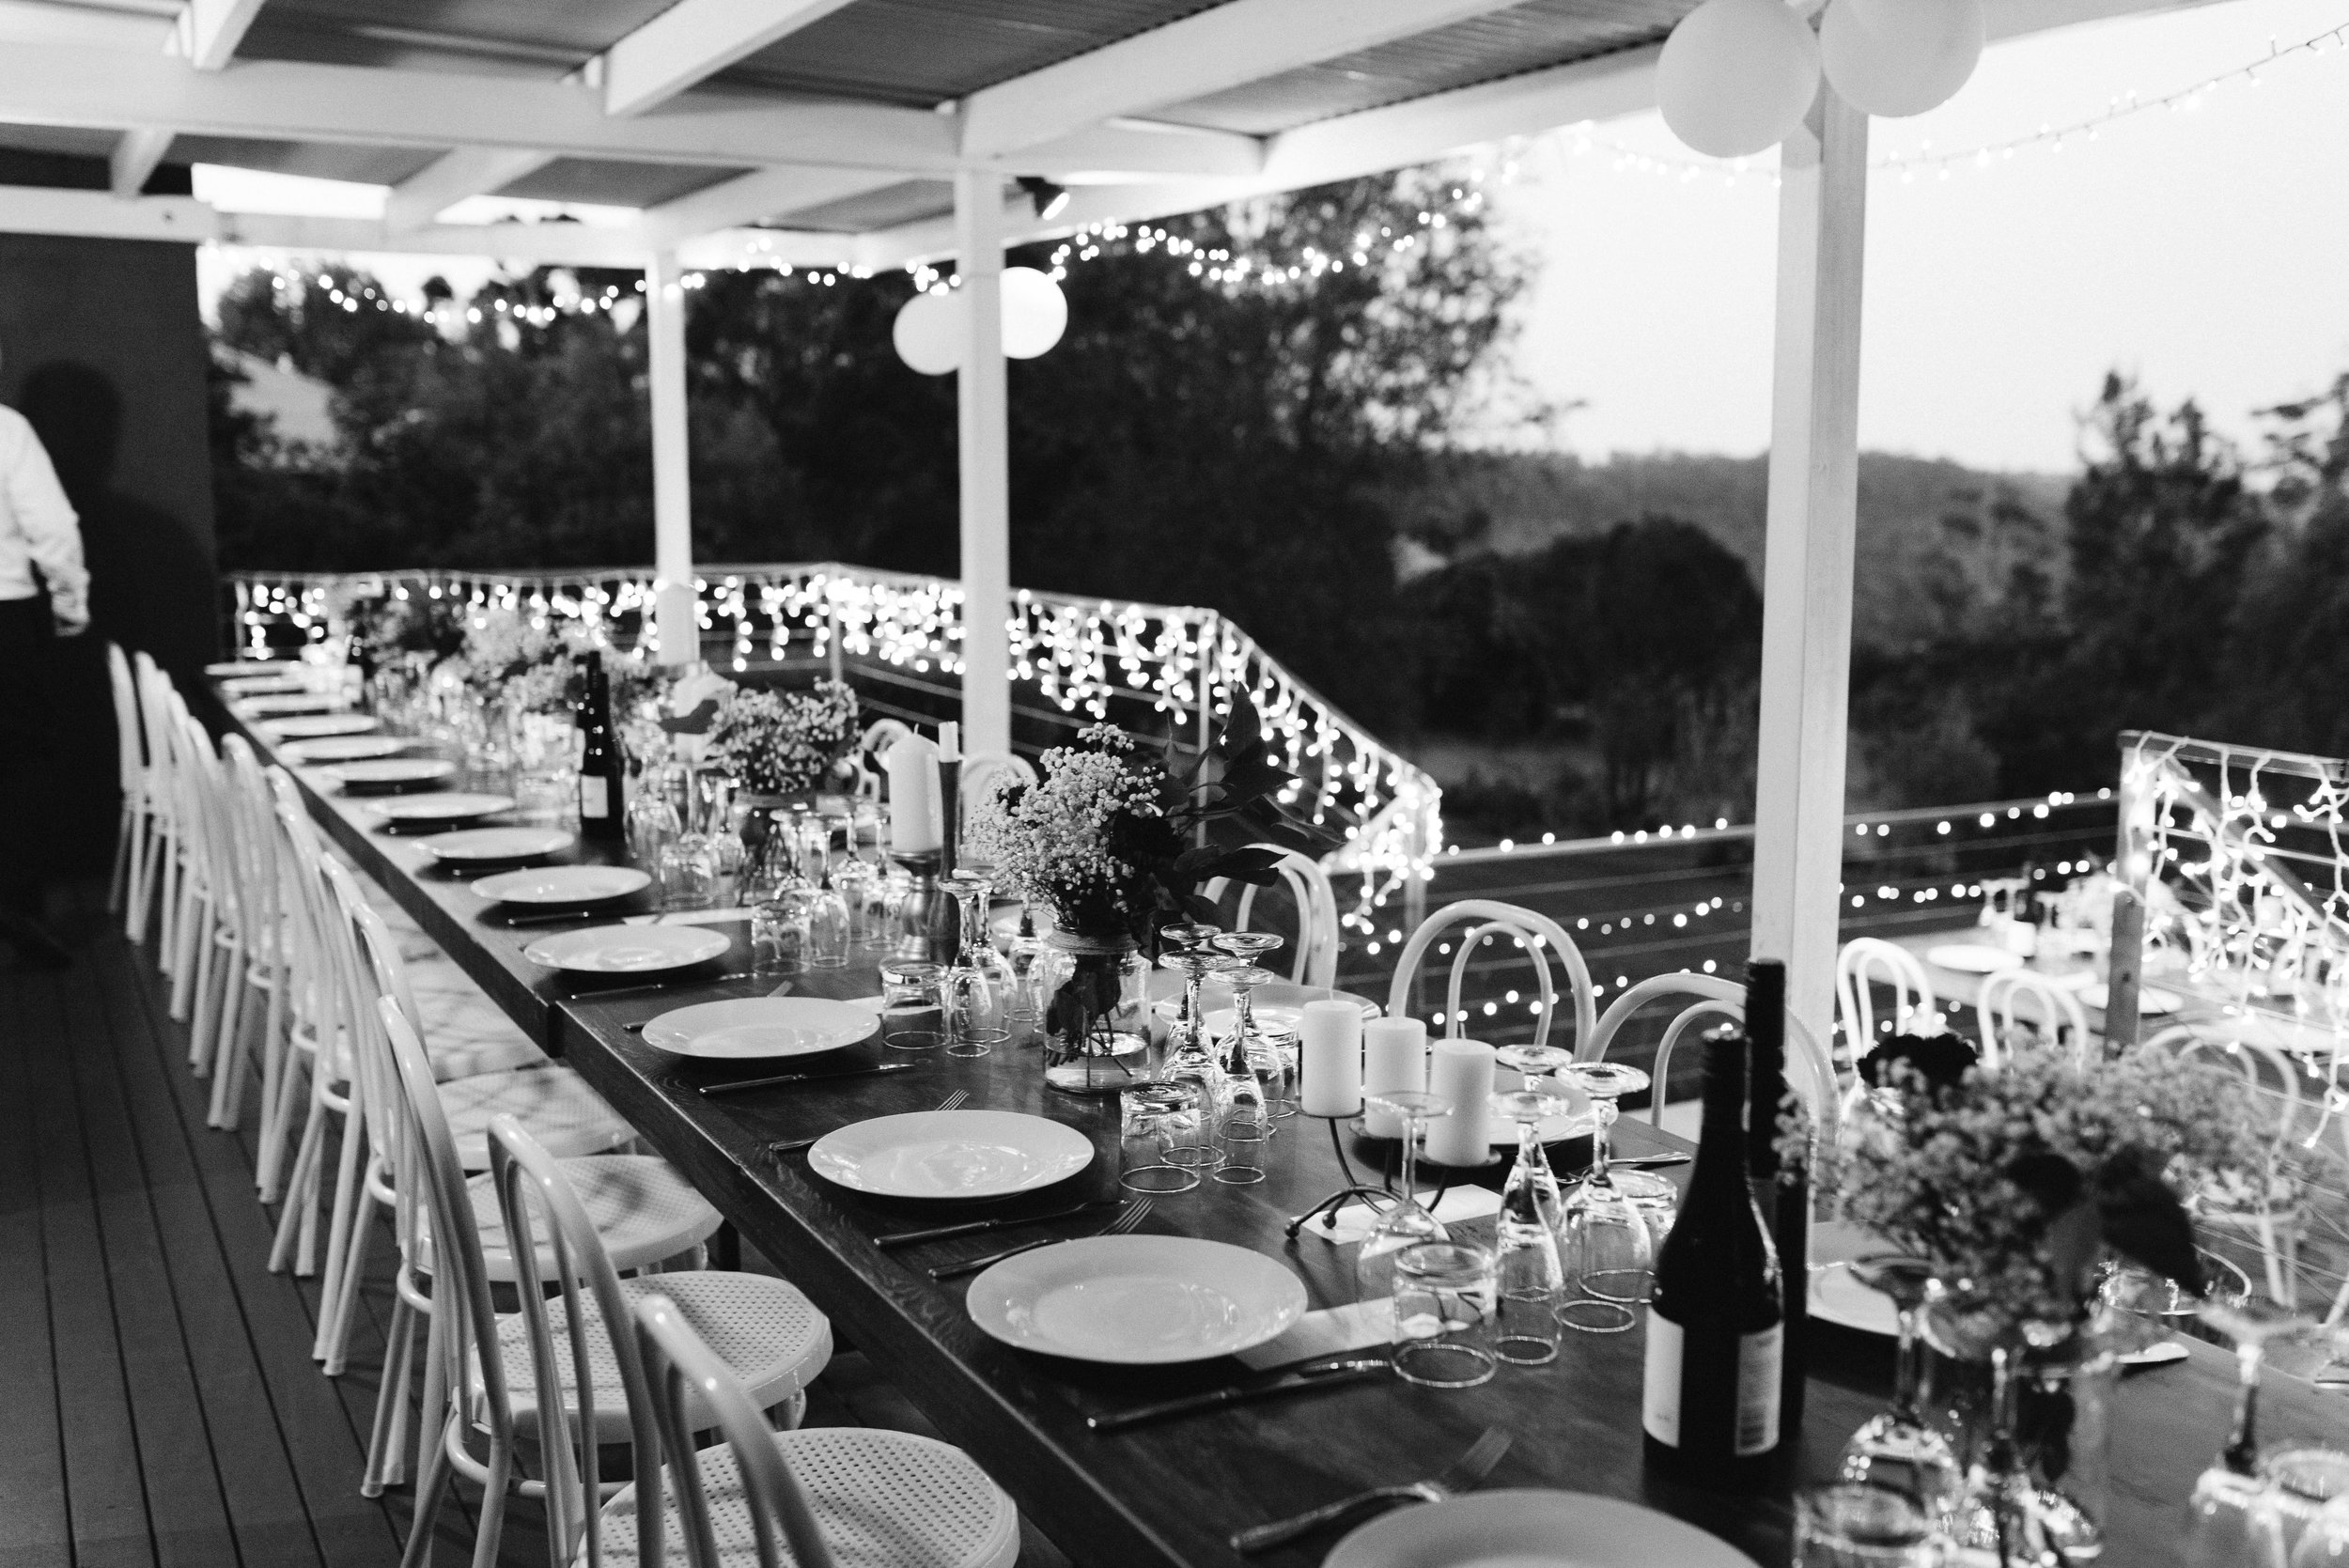 brisbane-gold-coast-sunshine-coast-wedding-photographer-mount-tamborine-wedding-1-71.jpg